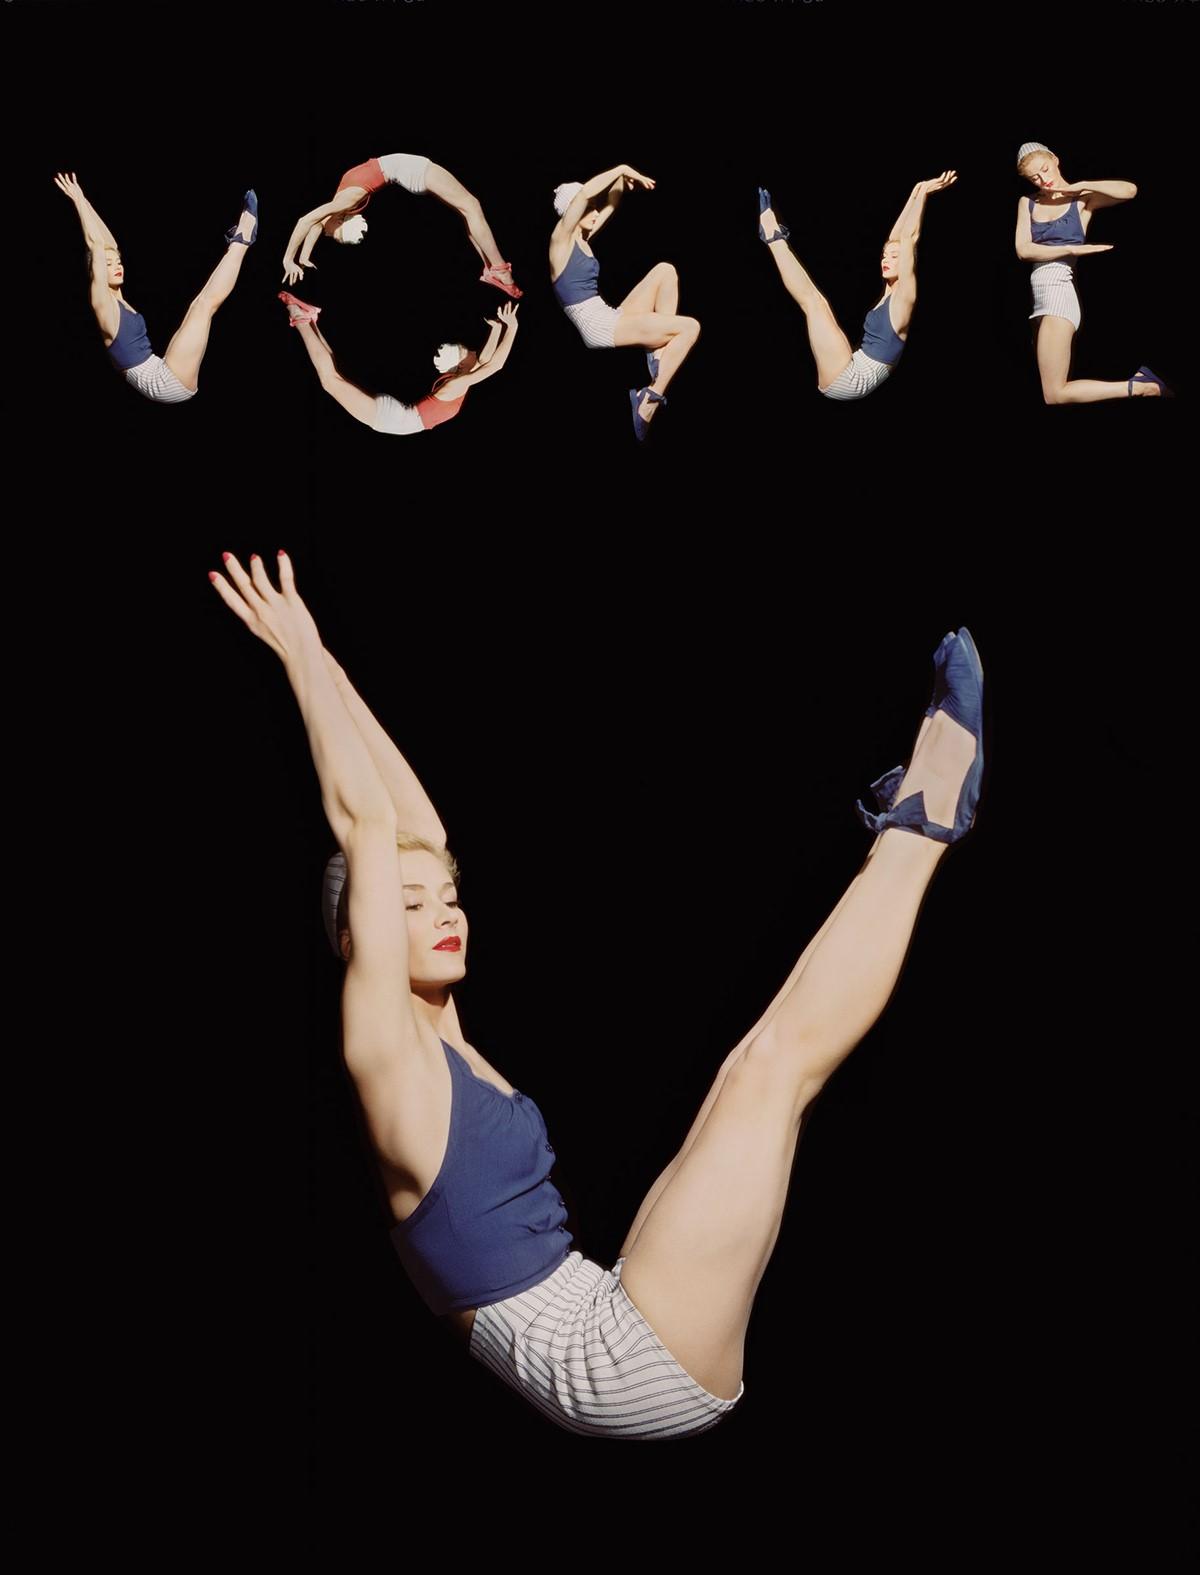 vogue,cover,letters,logo with models,horst,horst p. horst